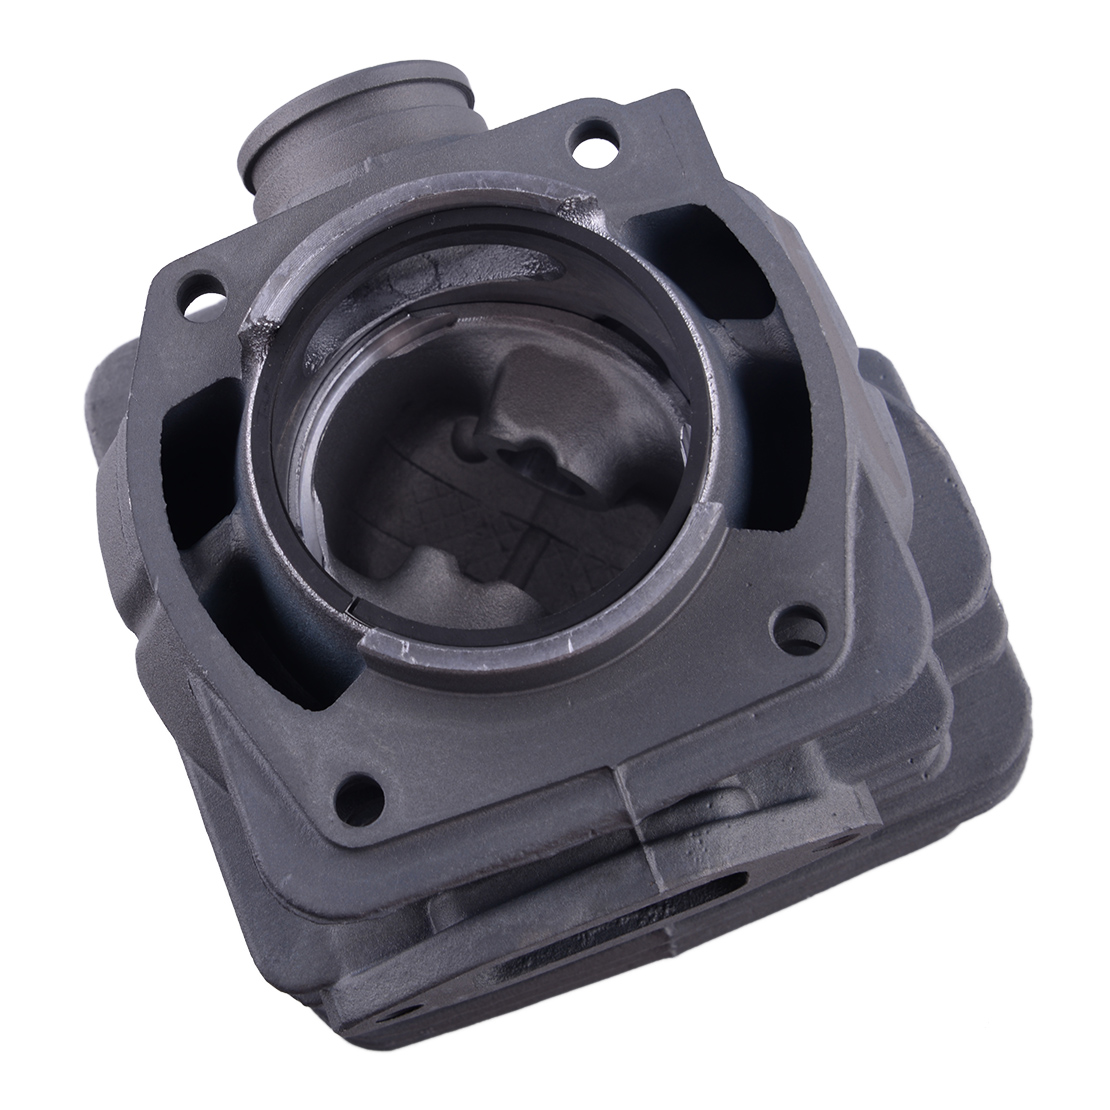 Jonsered 2063 Nikasil 503939372 Kit Cylinder 2171 2071 2163 CS For Gasket 2165 Fit Piston 50mm